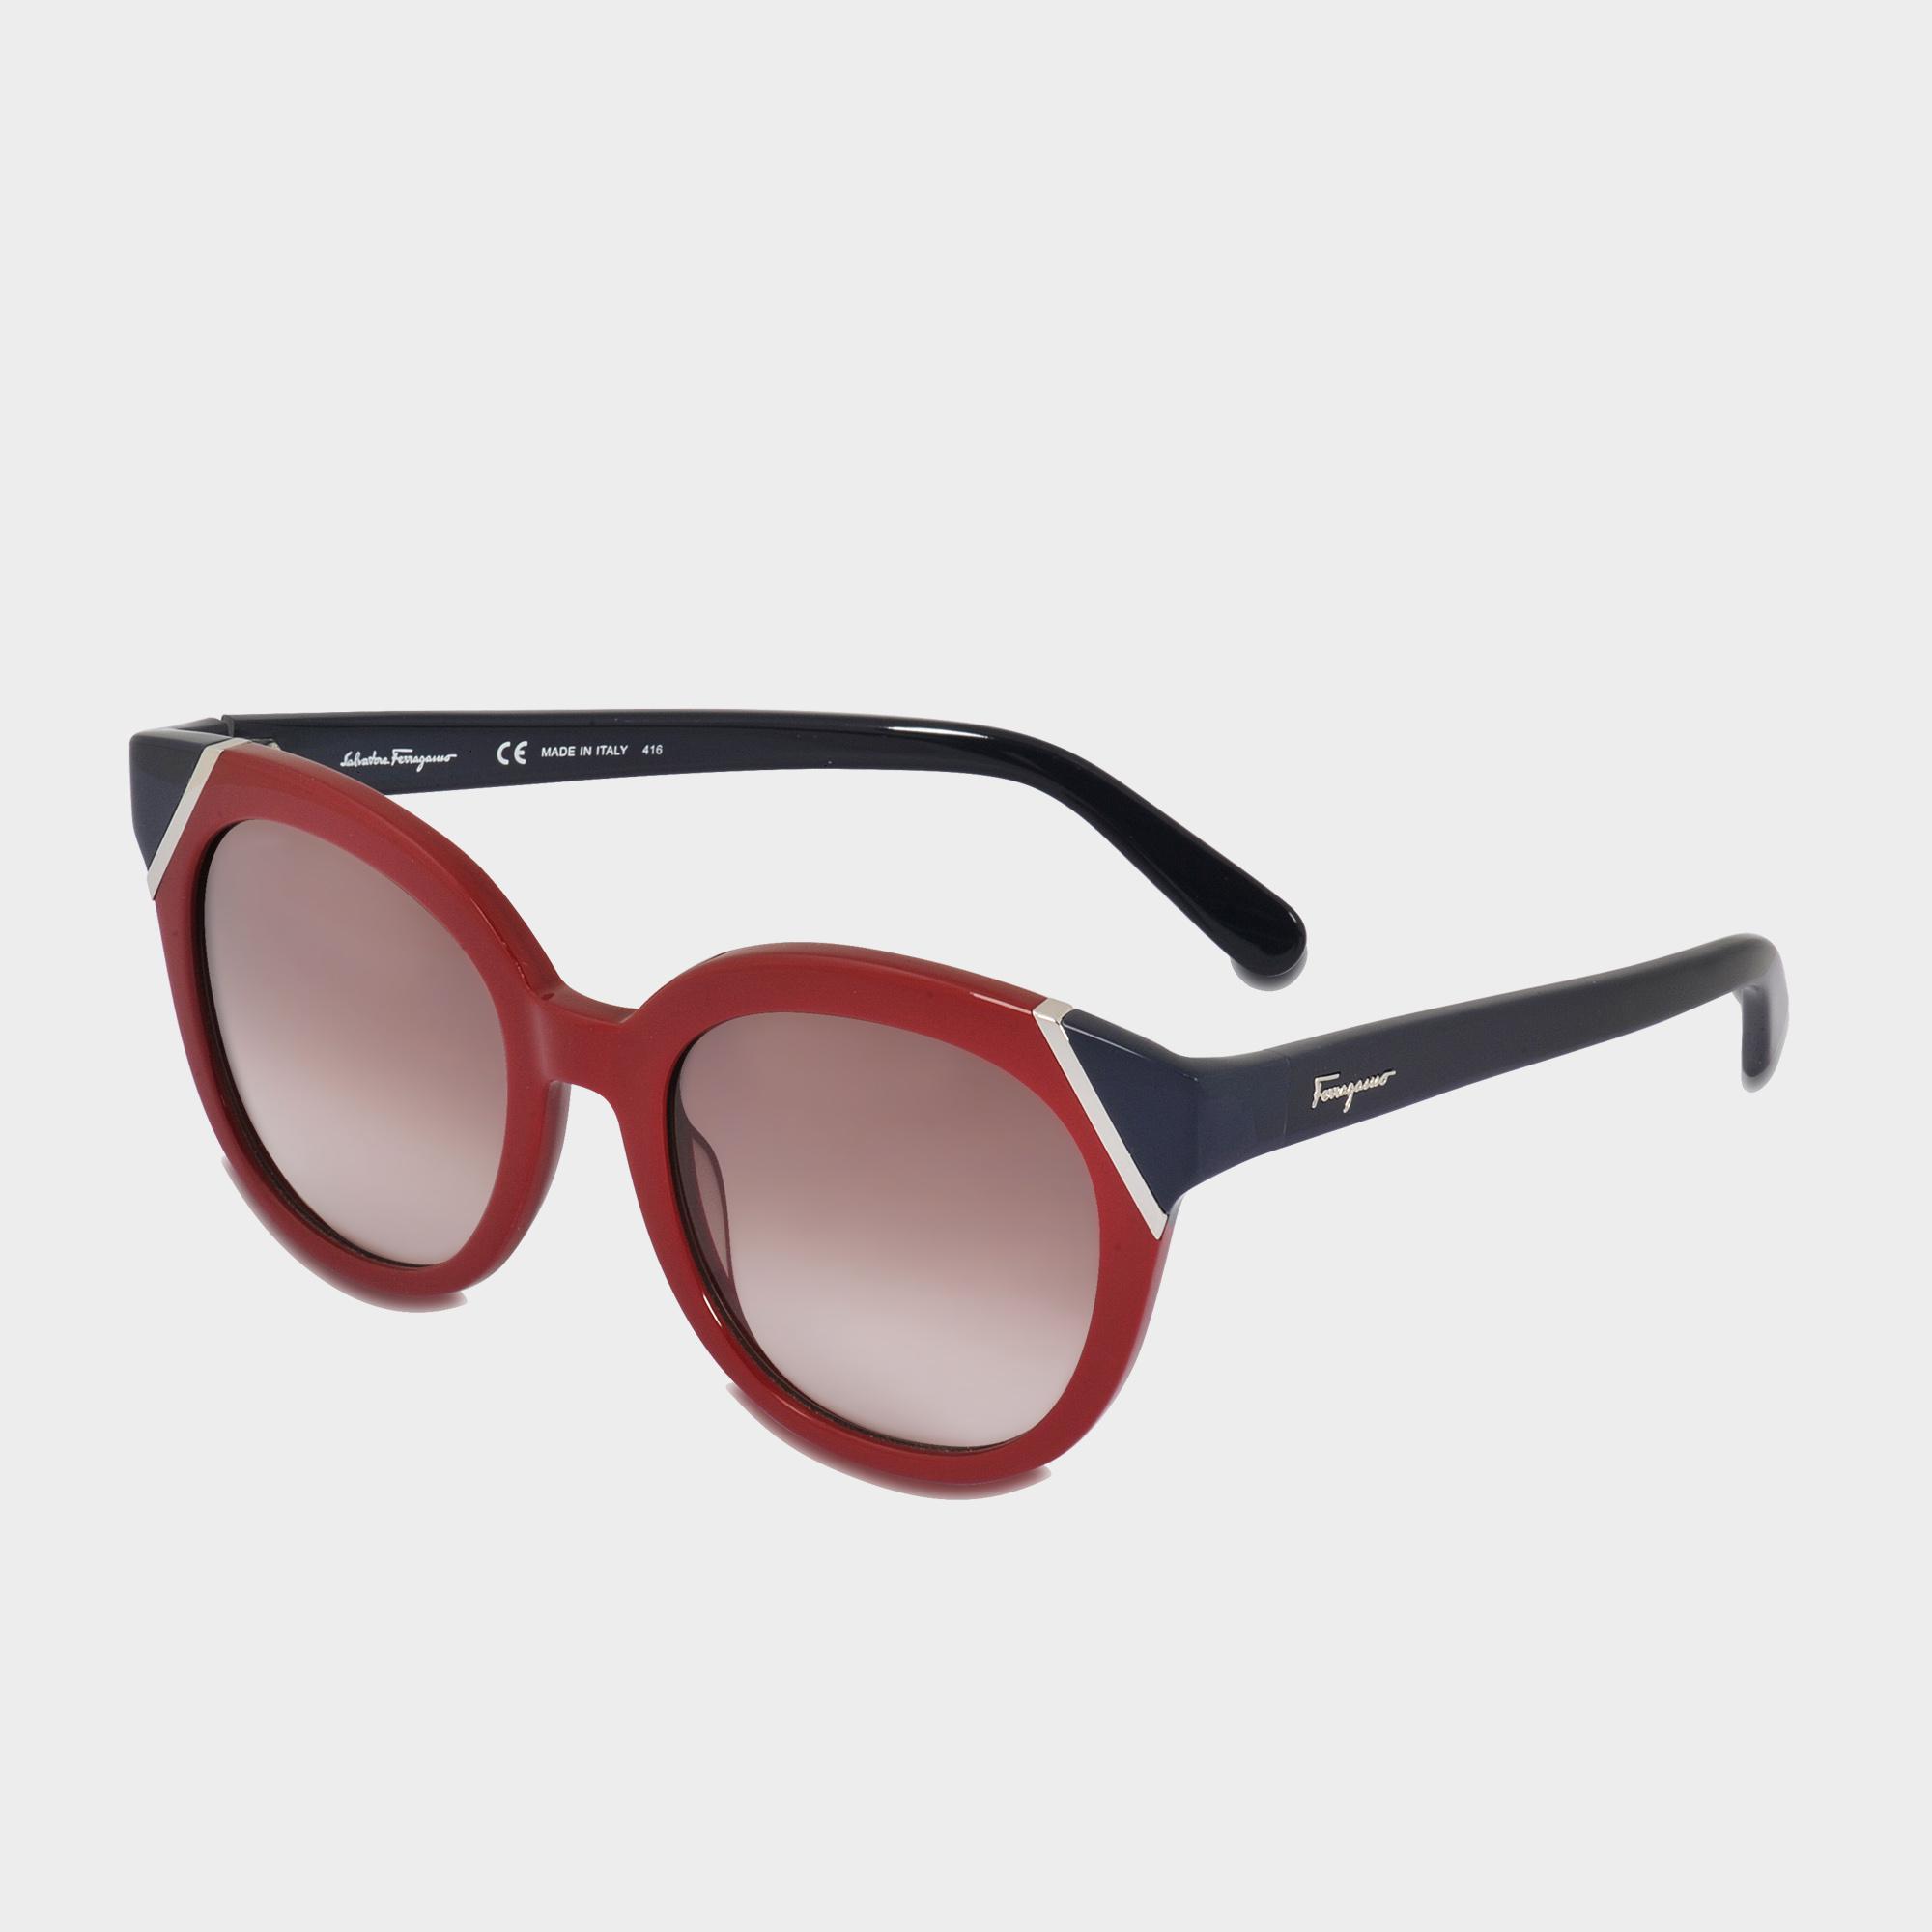 Ferragamo Colorblock Tea Cup Sunglasses